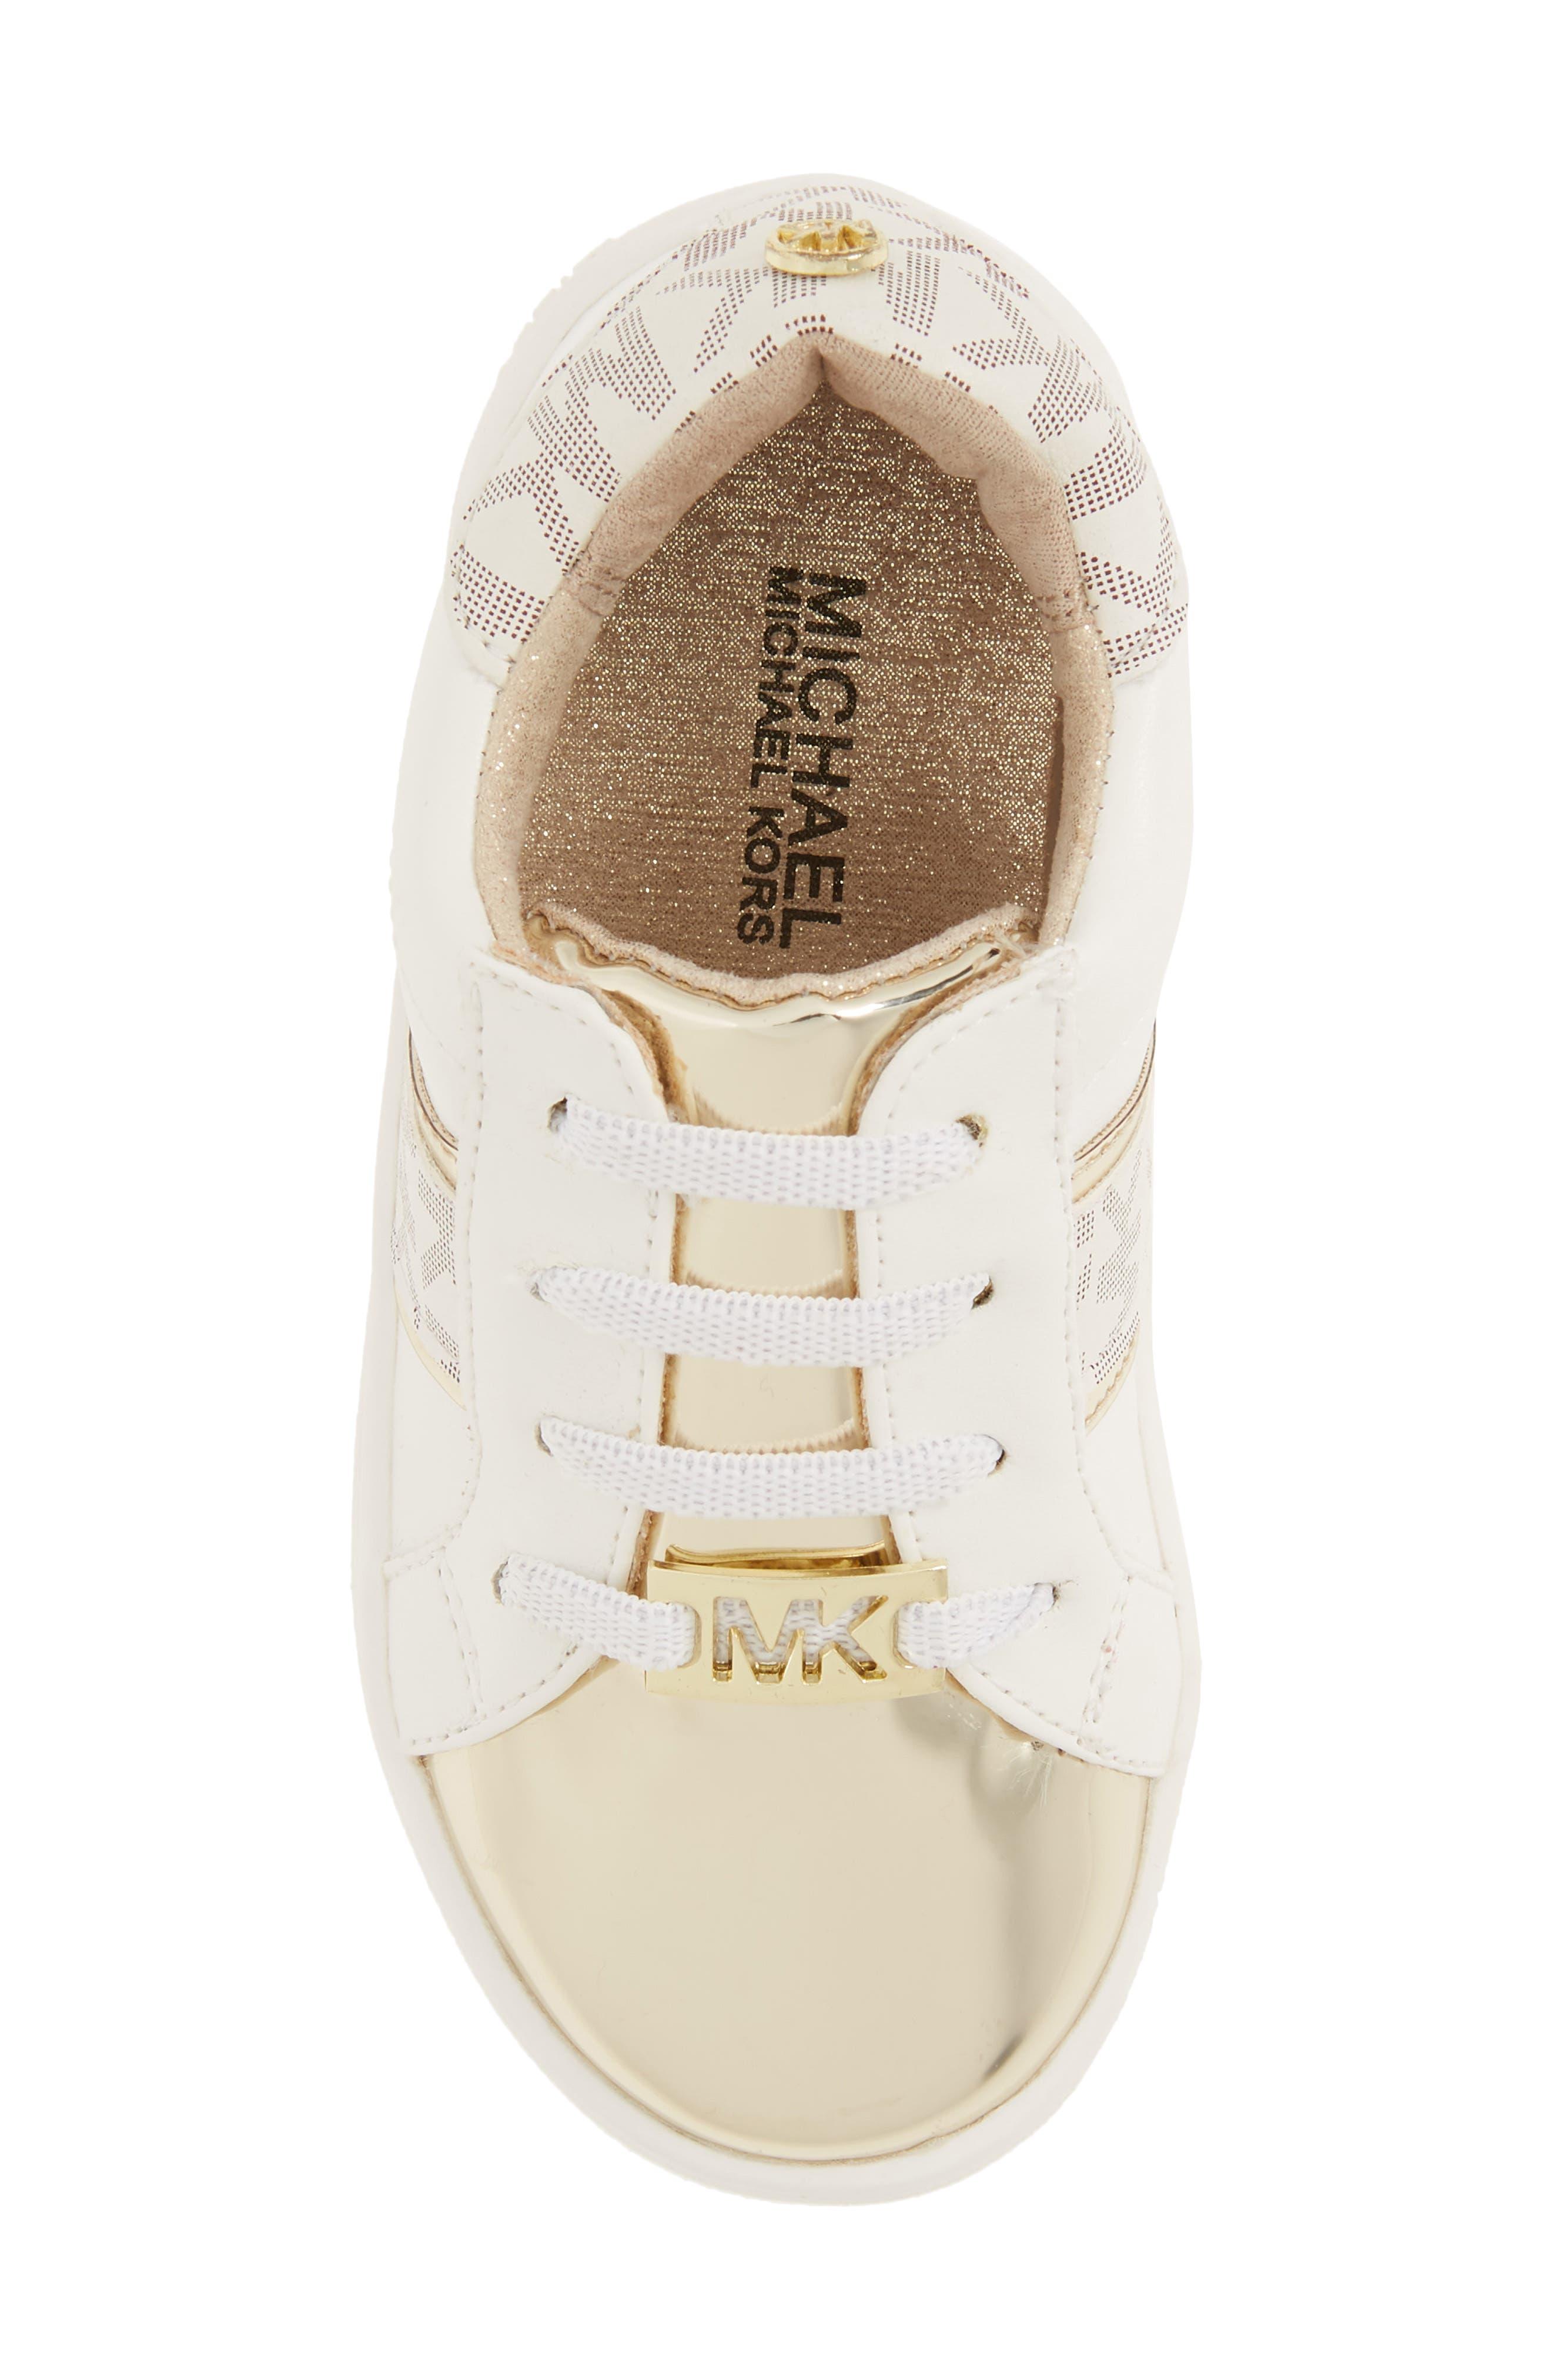 MICHAEL MICHAEL KORS,                             Ivy Frankie Metallic Logo Sneaker,                             Alternate thumbnail 5, color,                             100